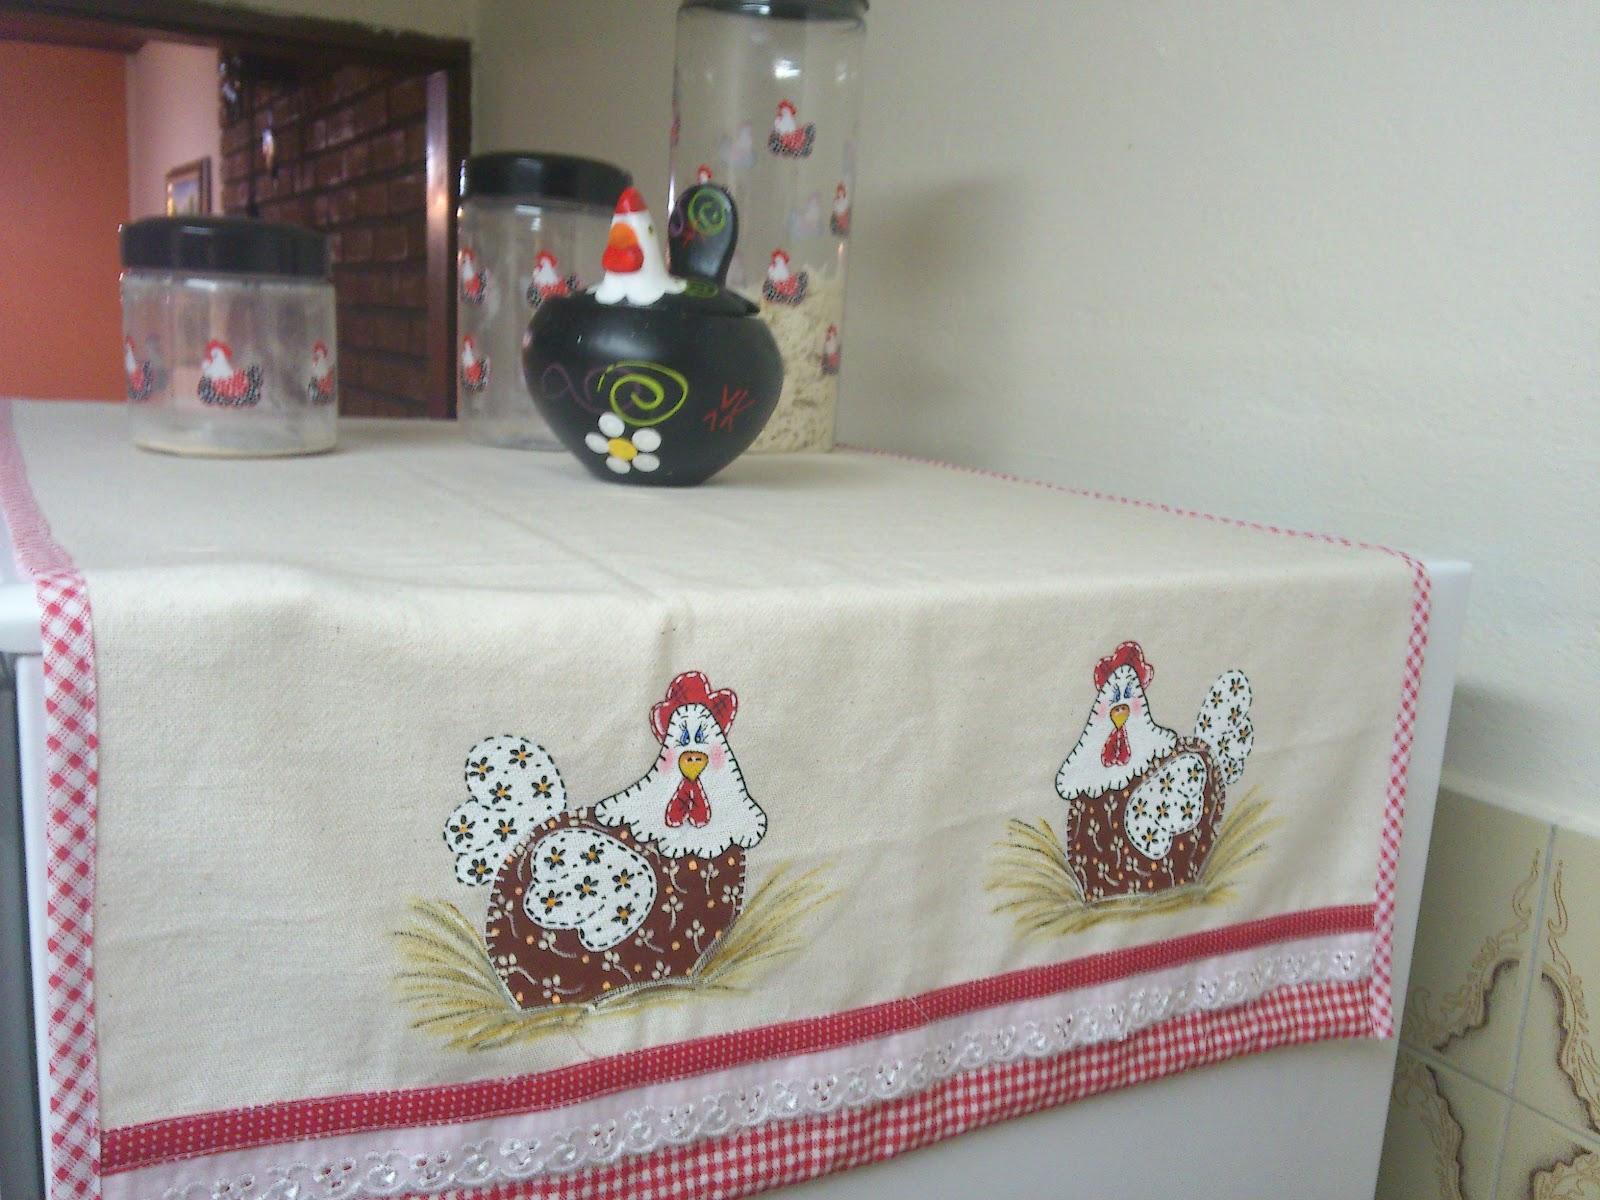 Pimenta Malagueta Artesanatos Kit De Cozinha Galinha Patchwork